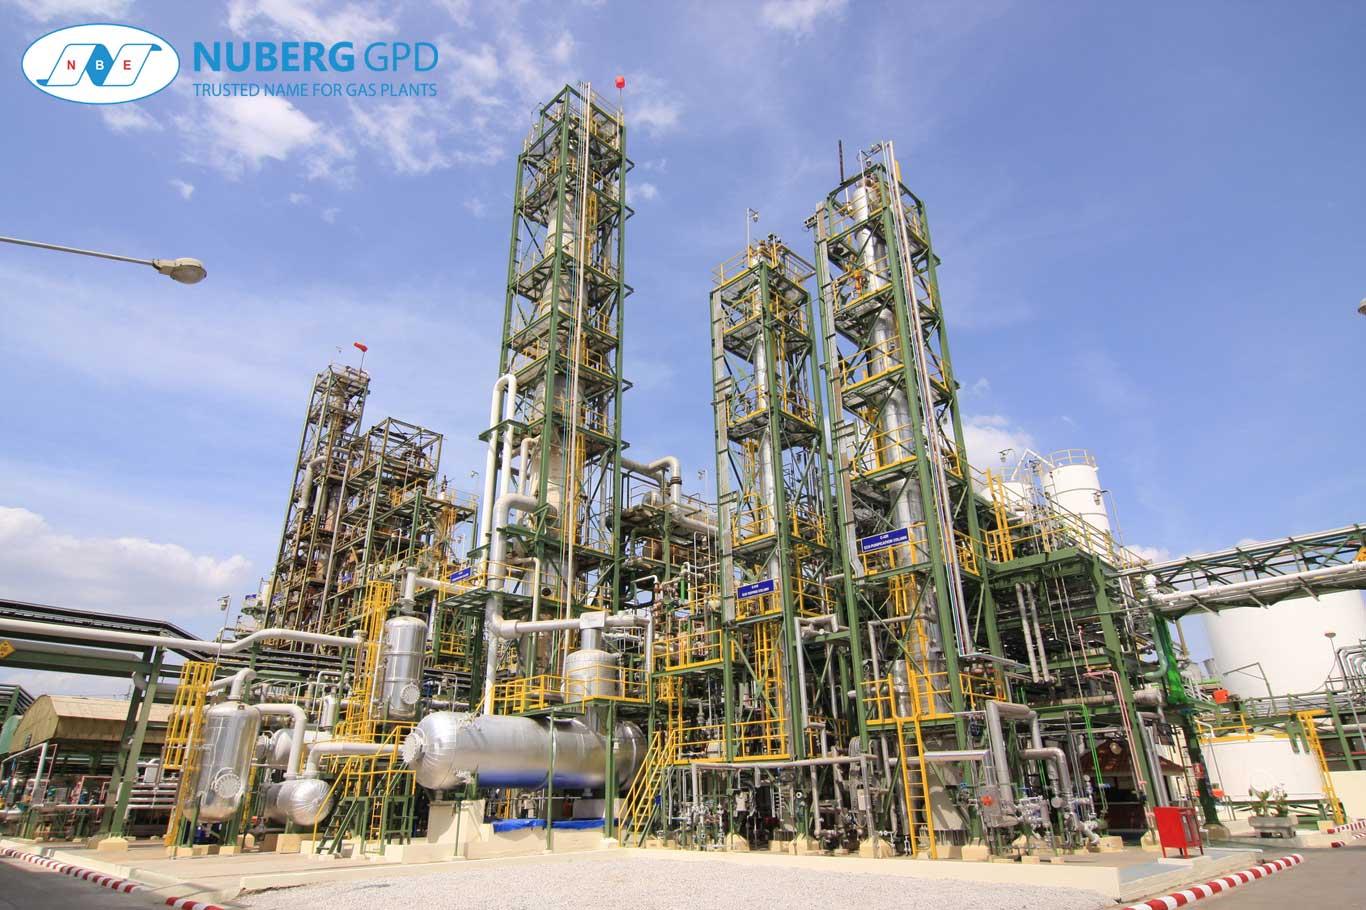 Methanol Cracking Hydrogen Plant Nuberg Gpd